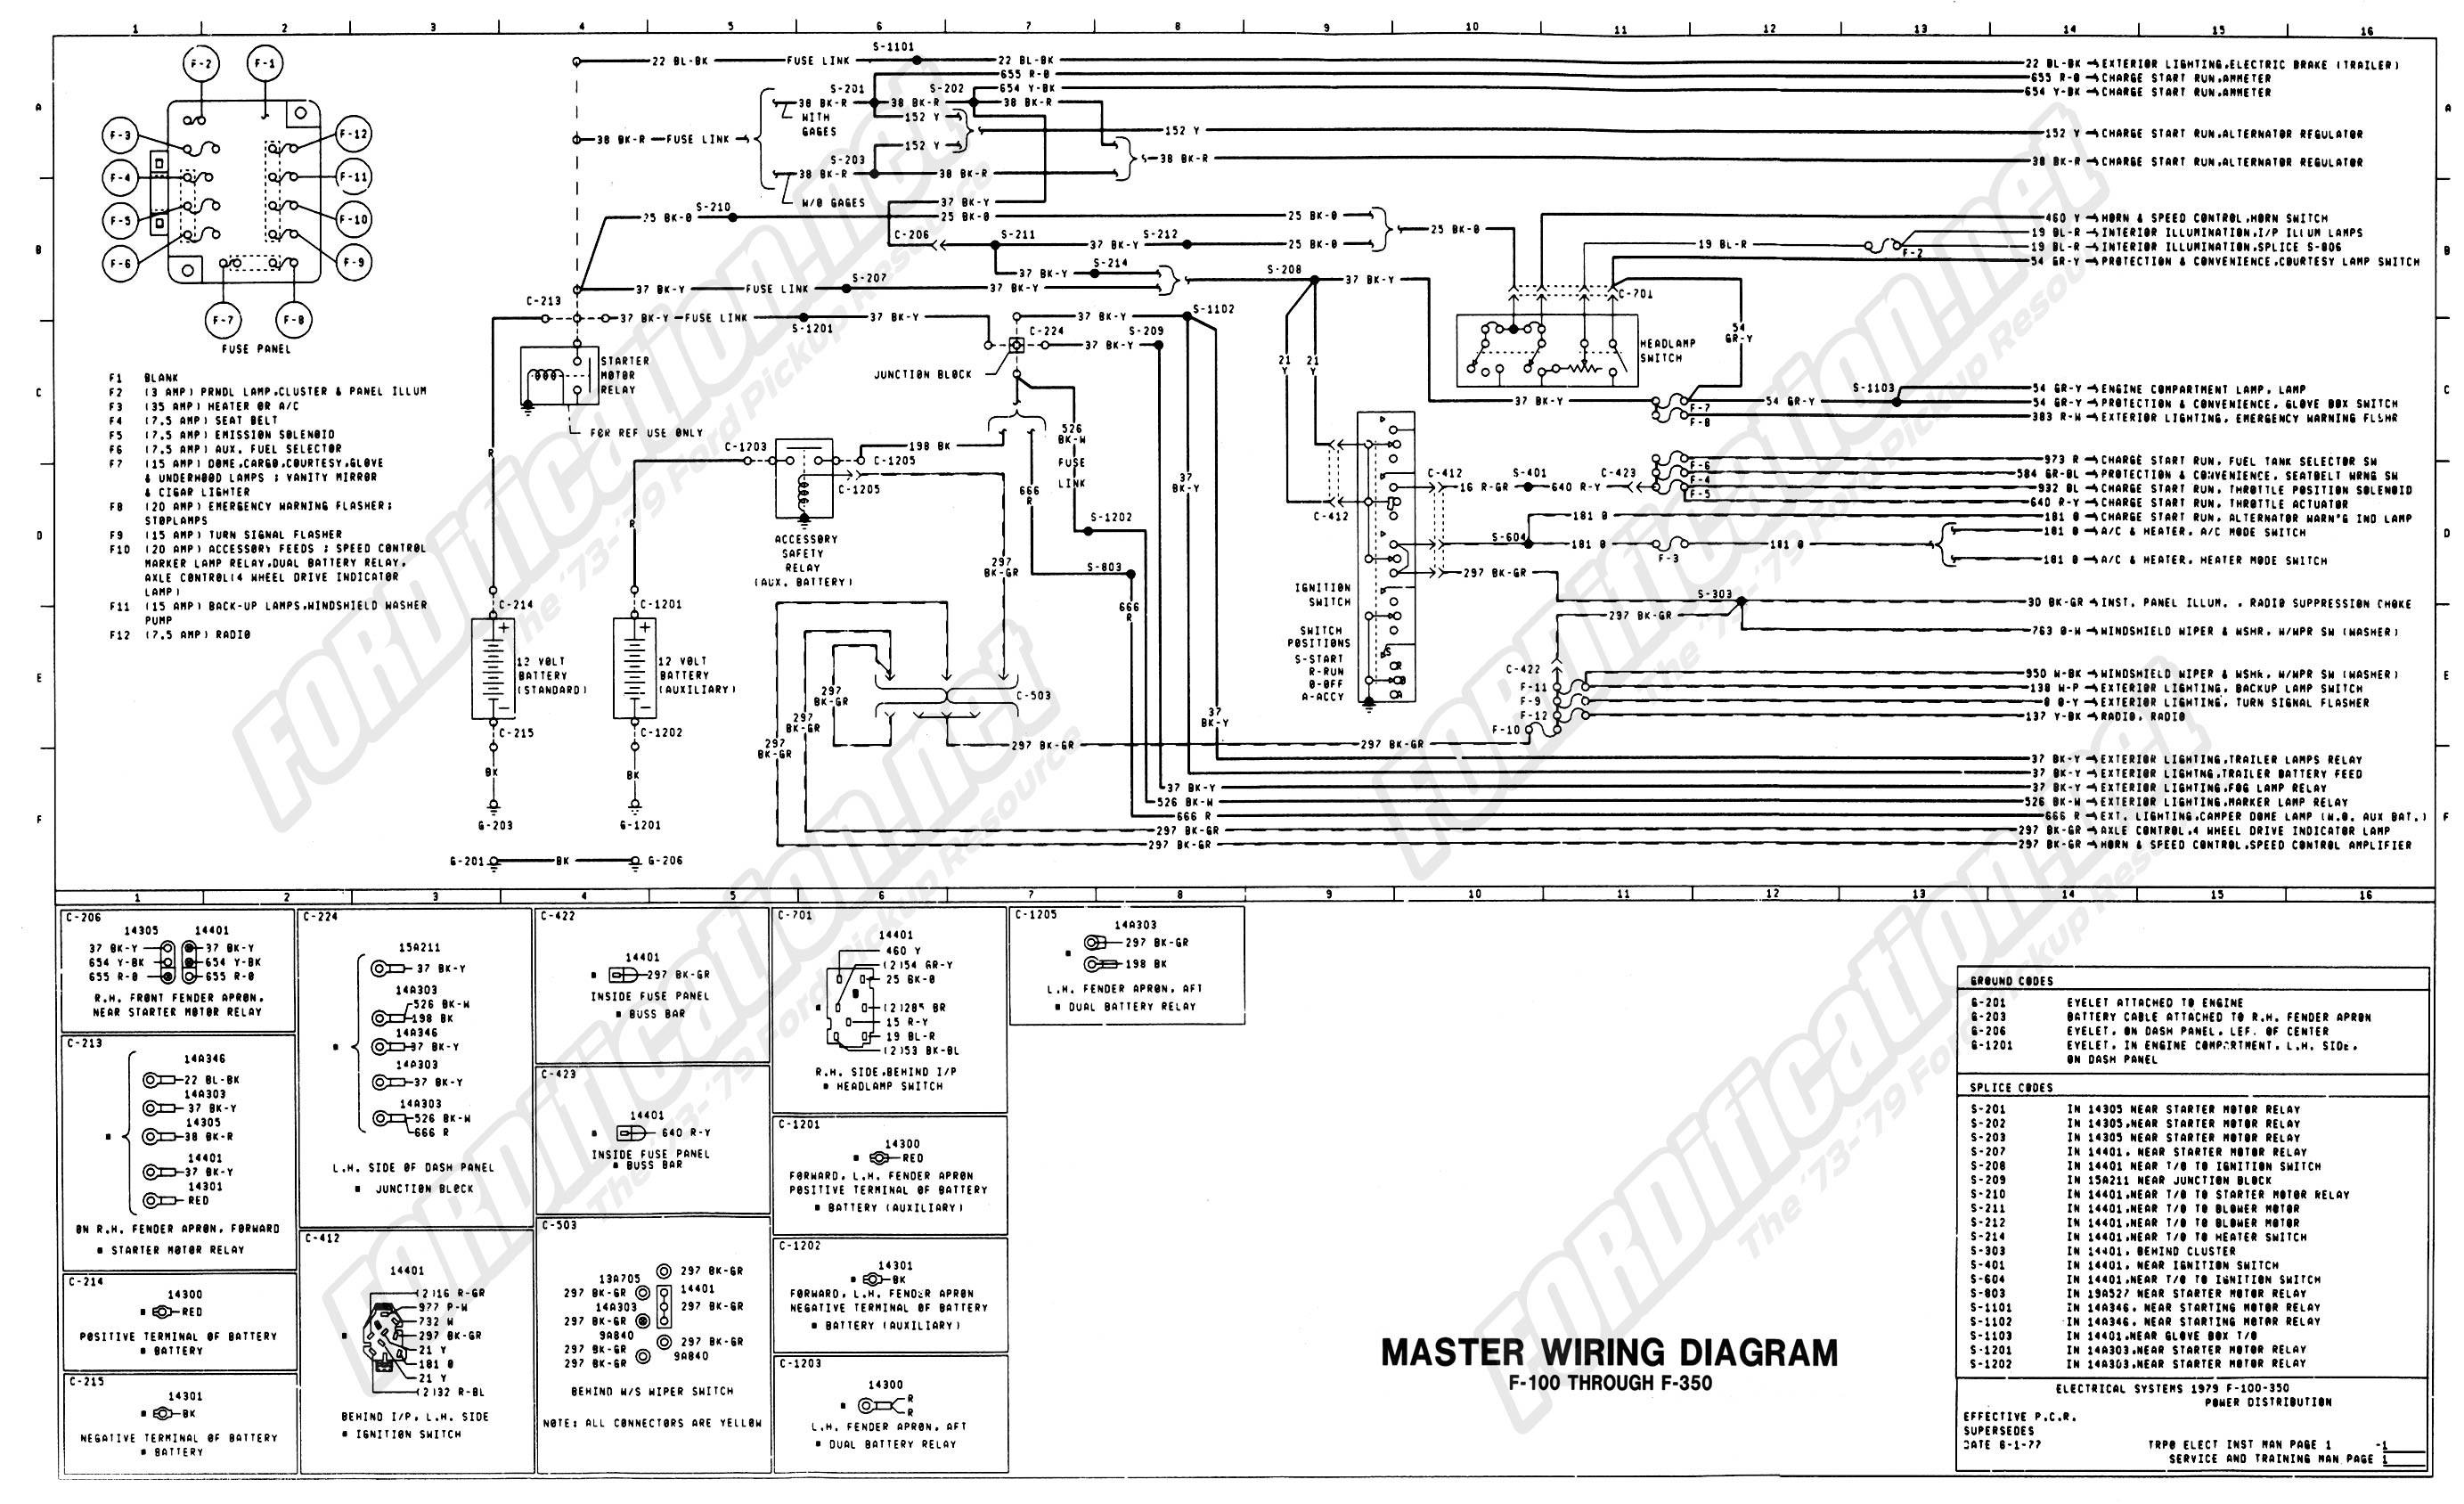 2004 ford F150 Wiring Diagram | Wiring Diagram Image